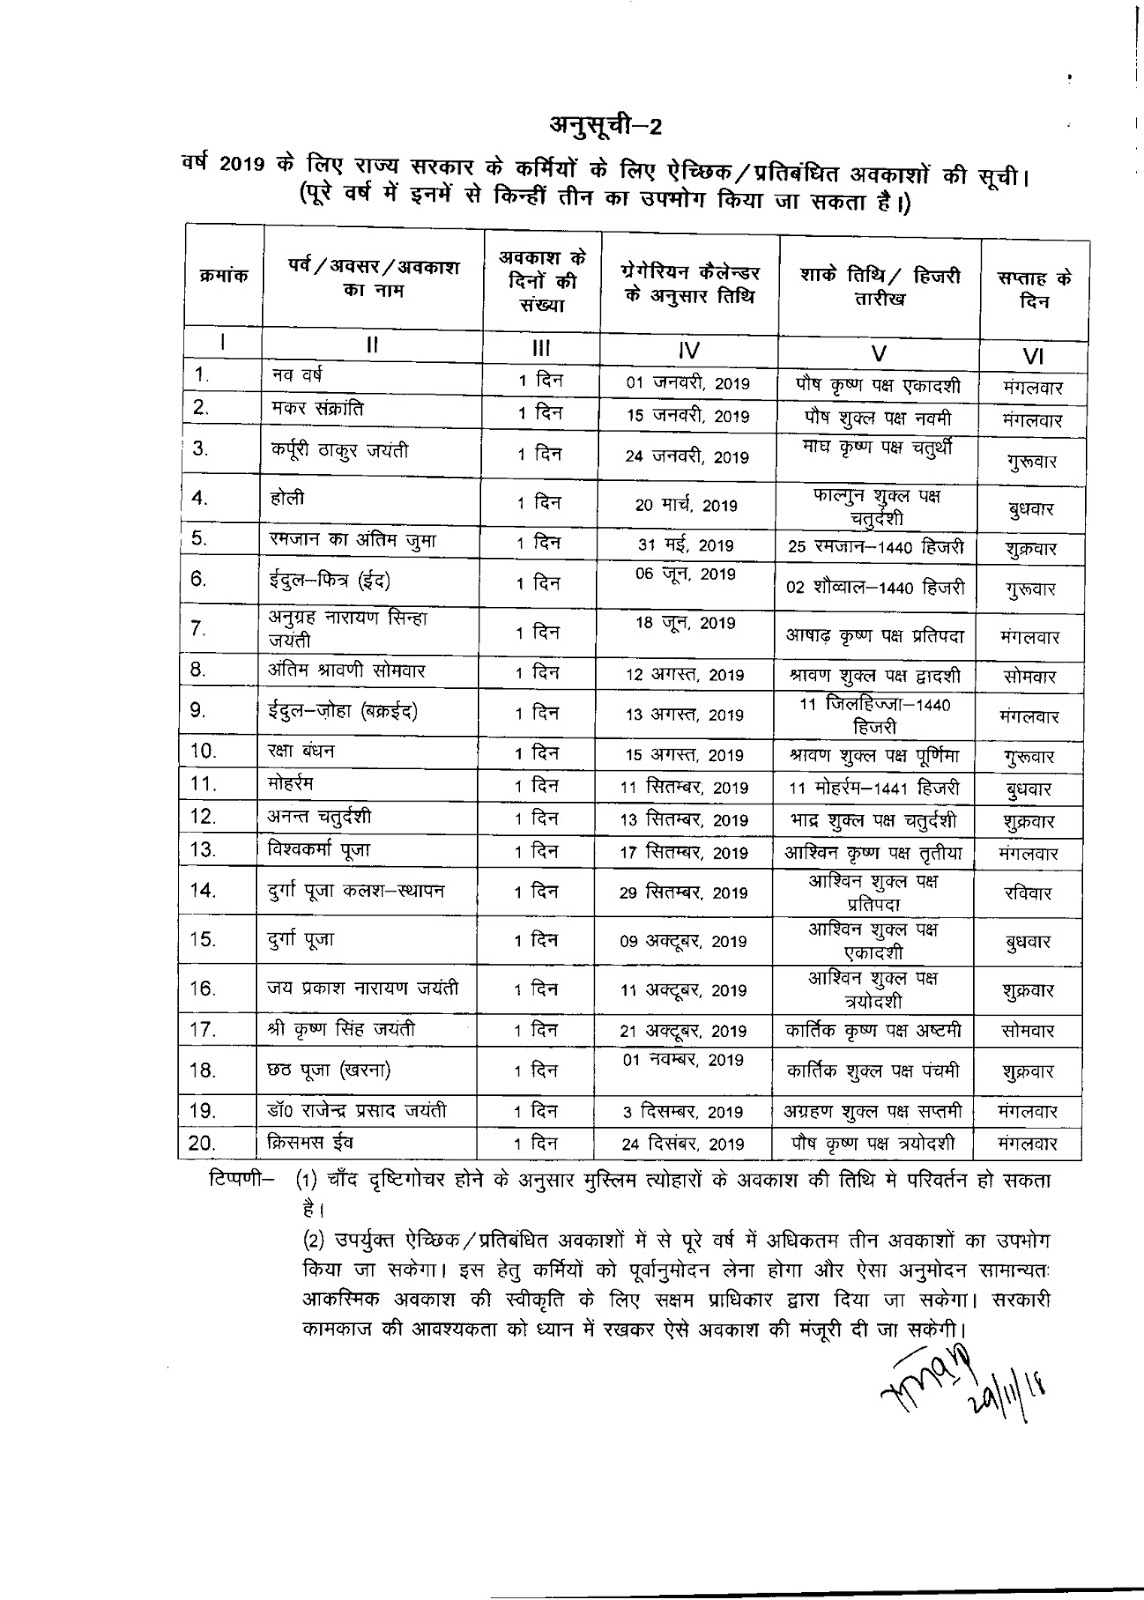 Bihar Government Calendar 2019 #educratsweb pertaining to Govt Of Bihar Calendar 2020